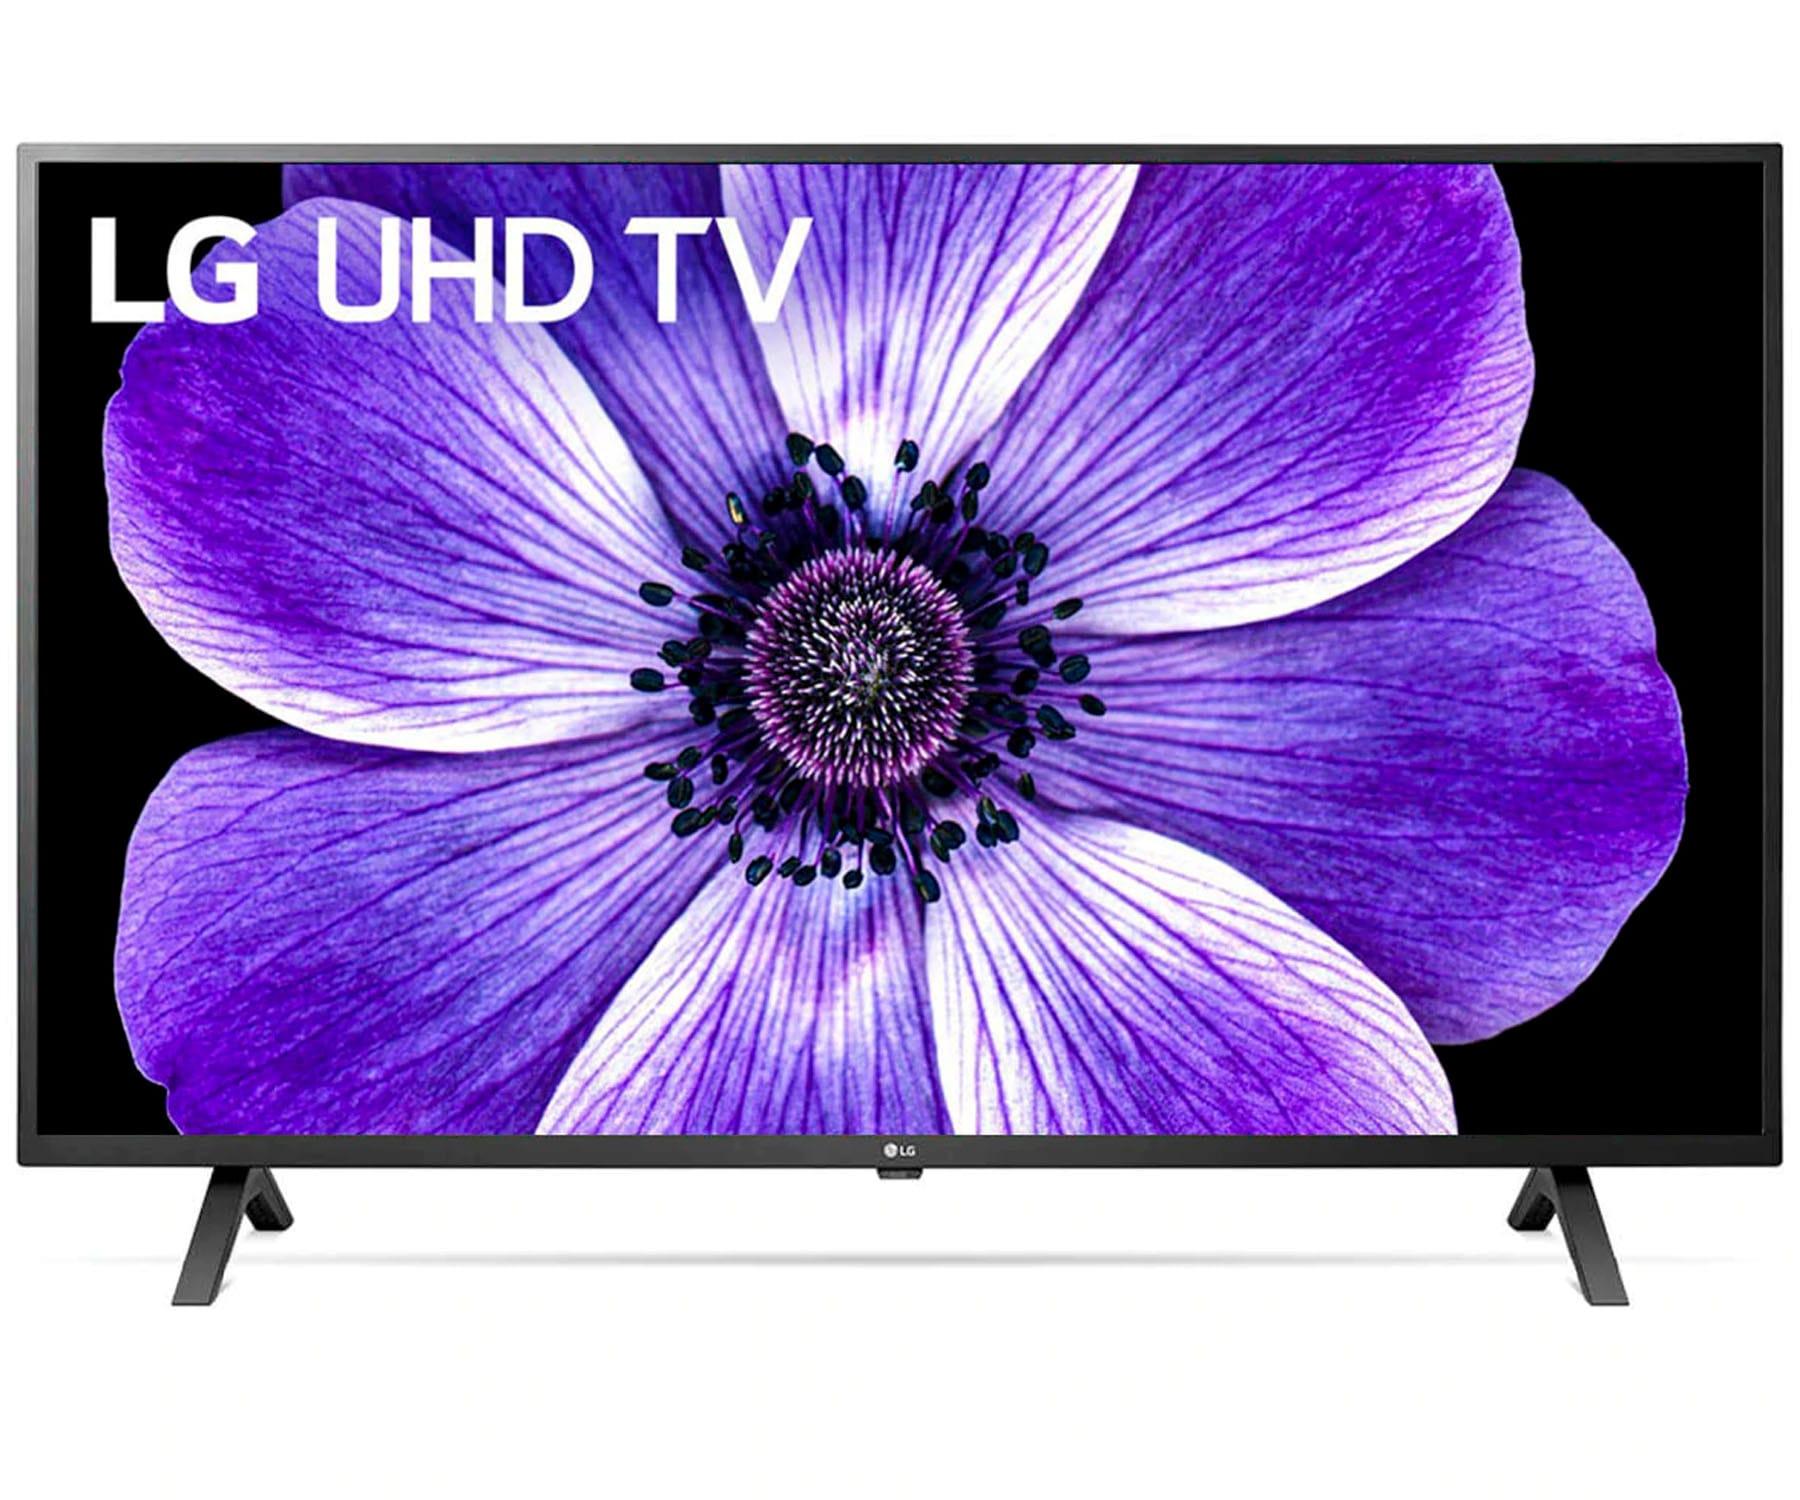 LG 55UN70006LA NEGRO TELEVISOR 55'' LED IPS 4K SMART TV HDR HDMI USB WIFI